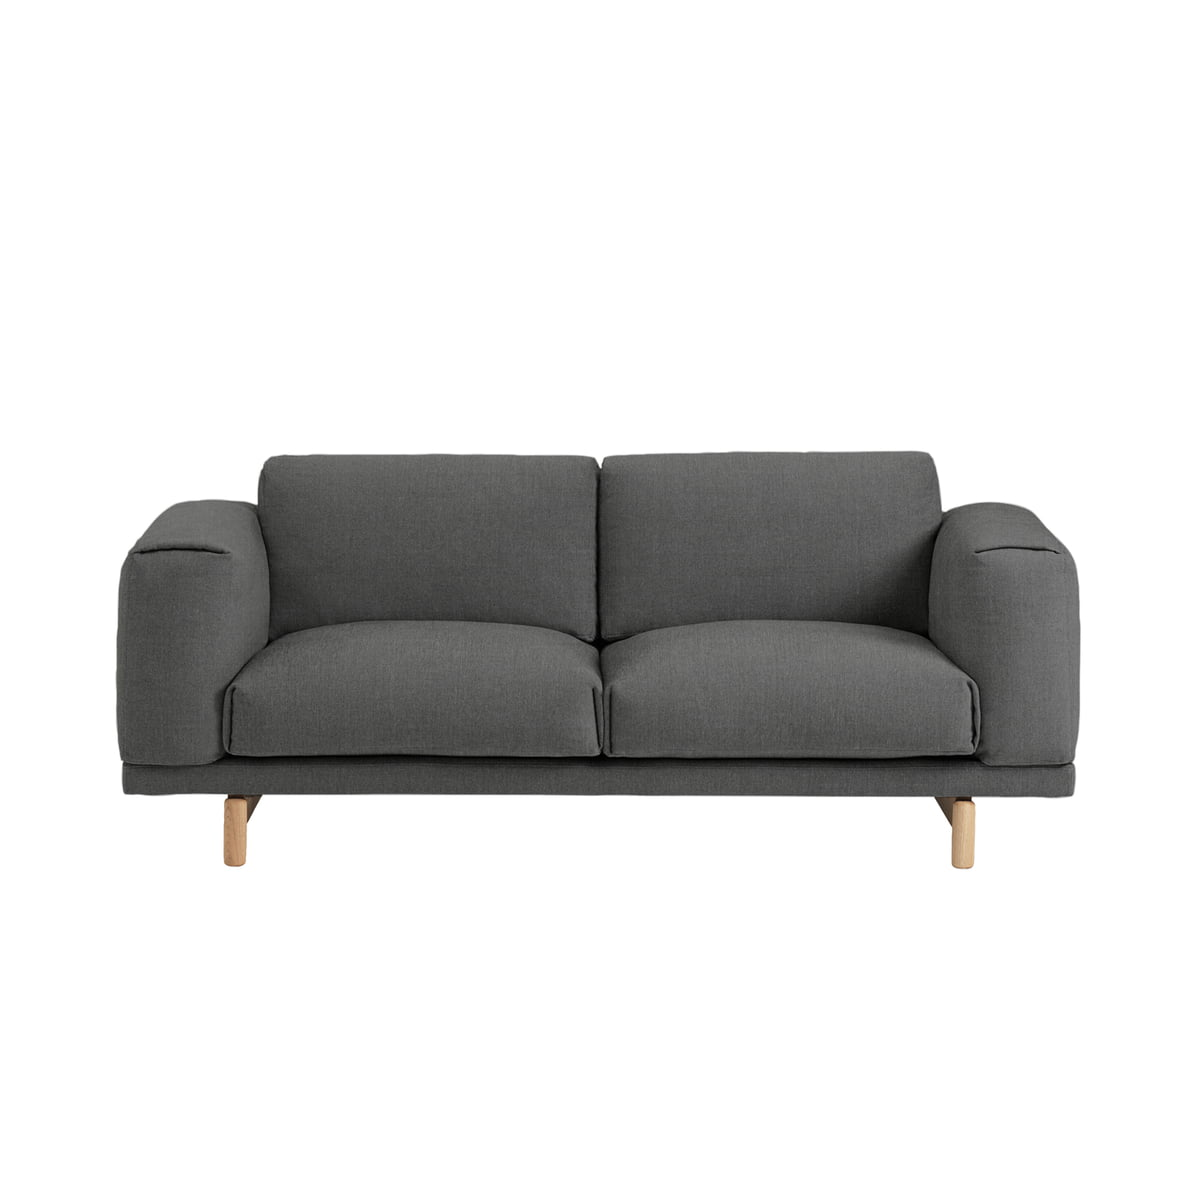 rest studio sofa muuto connox shop. Black Bedroom Furniture Sets. Home Design Ideas